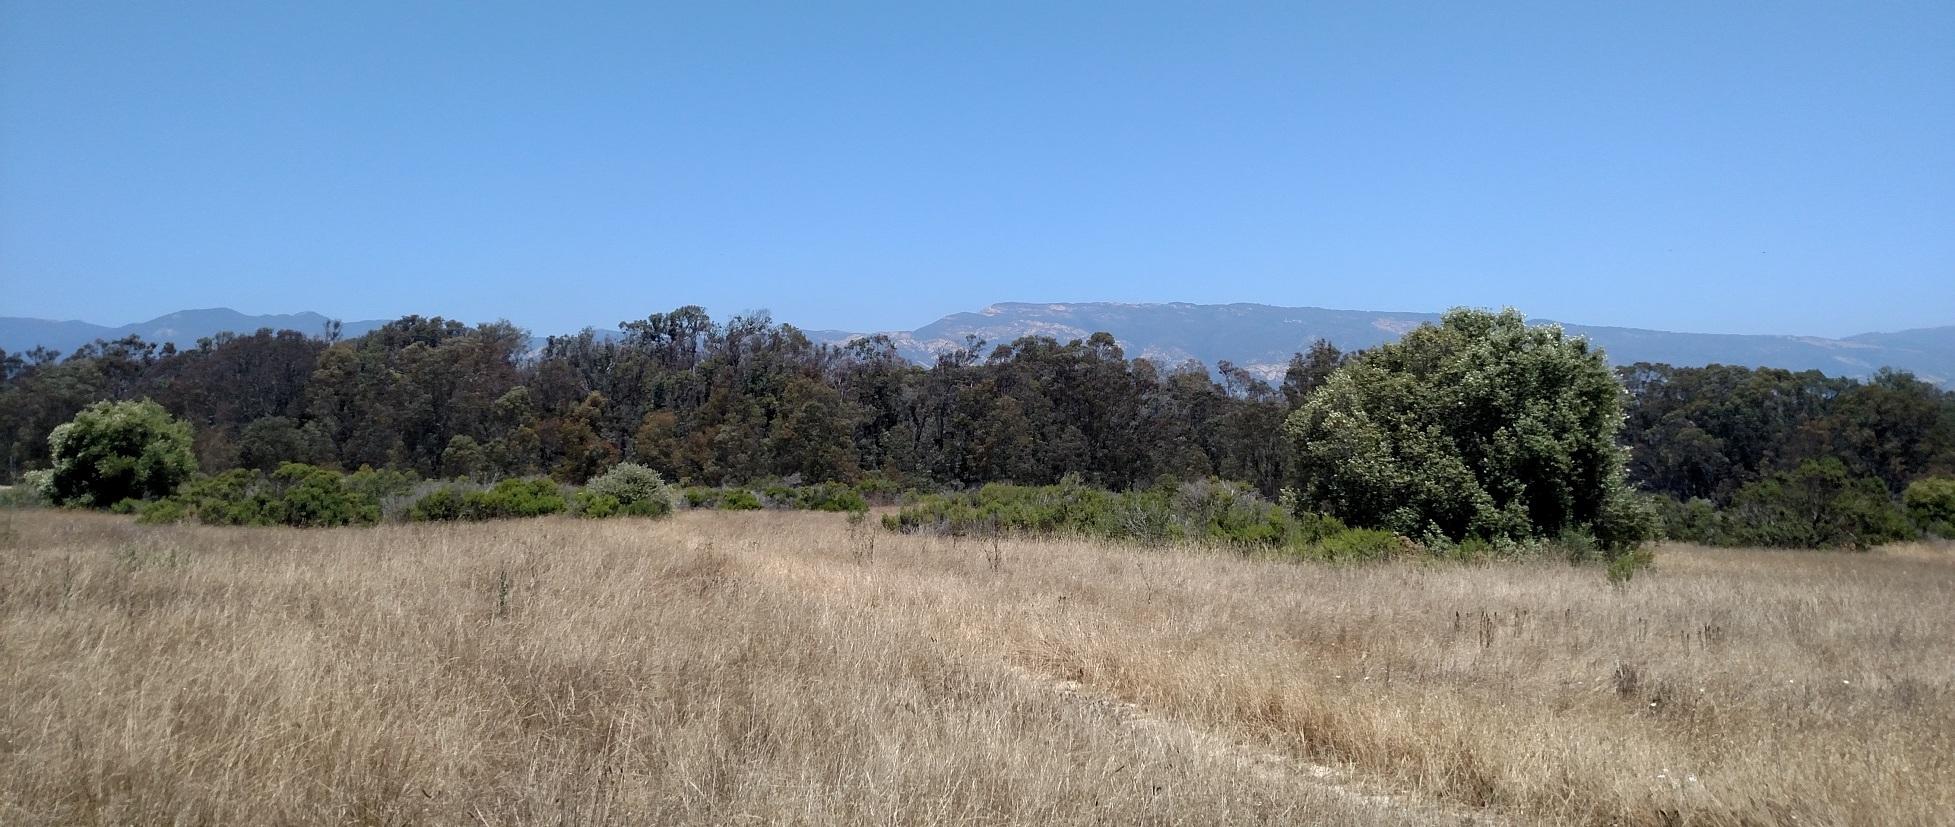 Ellwood Mesa, Santa Barbara County, CA